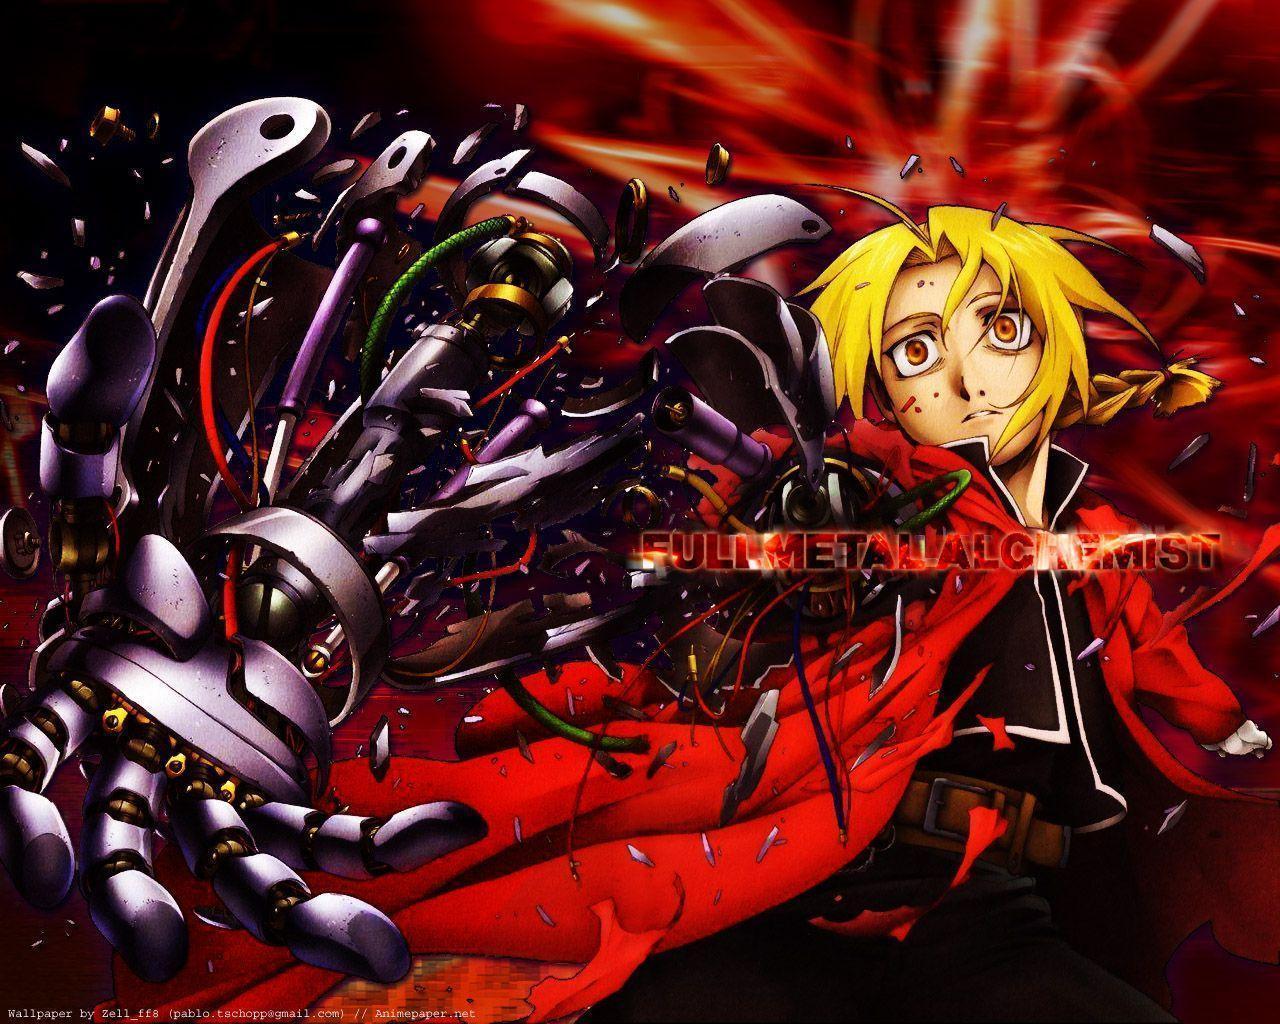 wallpapers anime fullmetal alchemist - photo #43